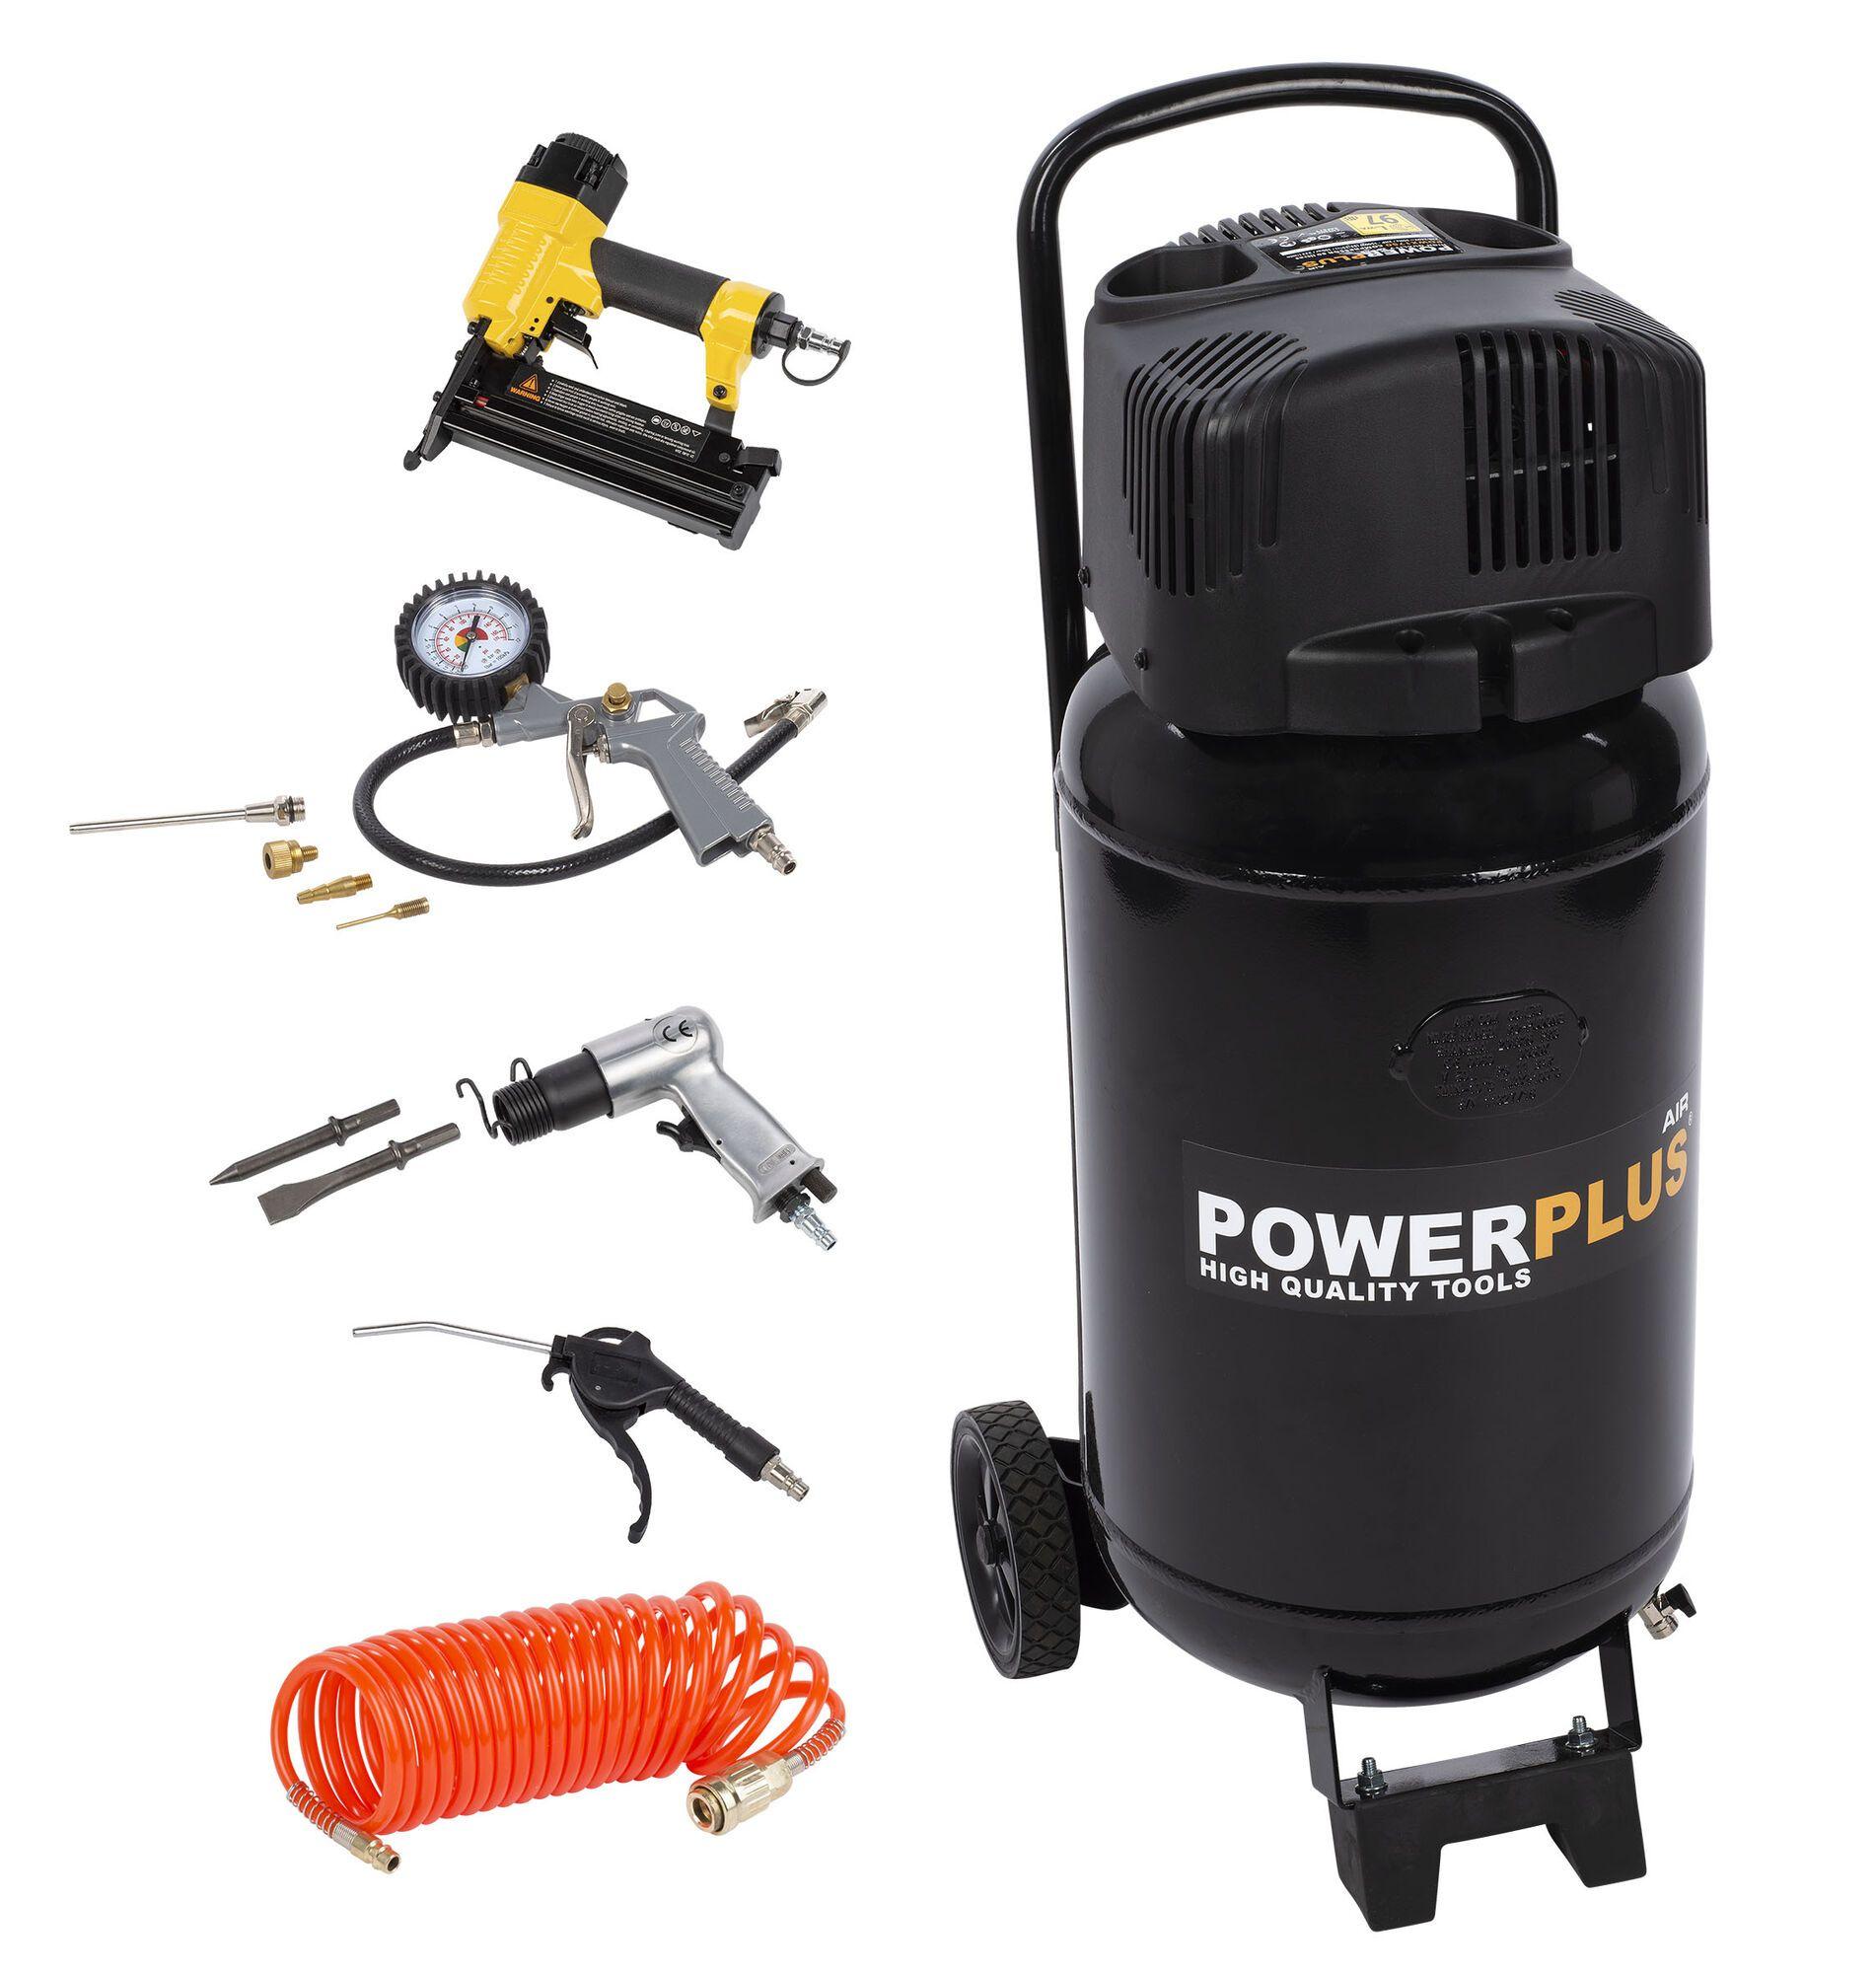 Powerplus POWX1751 1100W 50L Compressor   Olievrij + 12 Accessoires